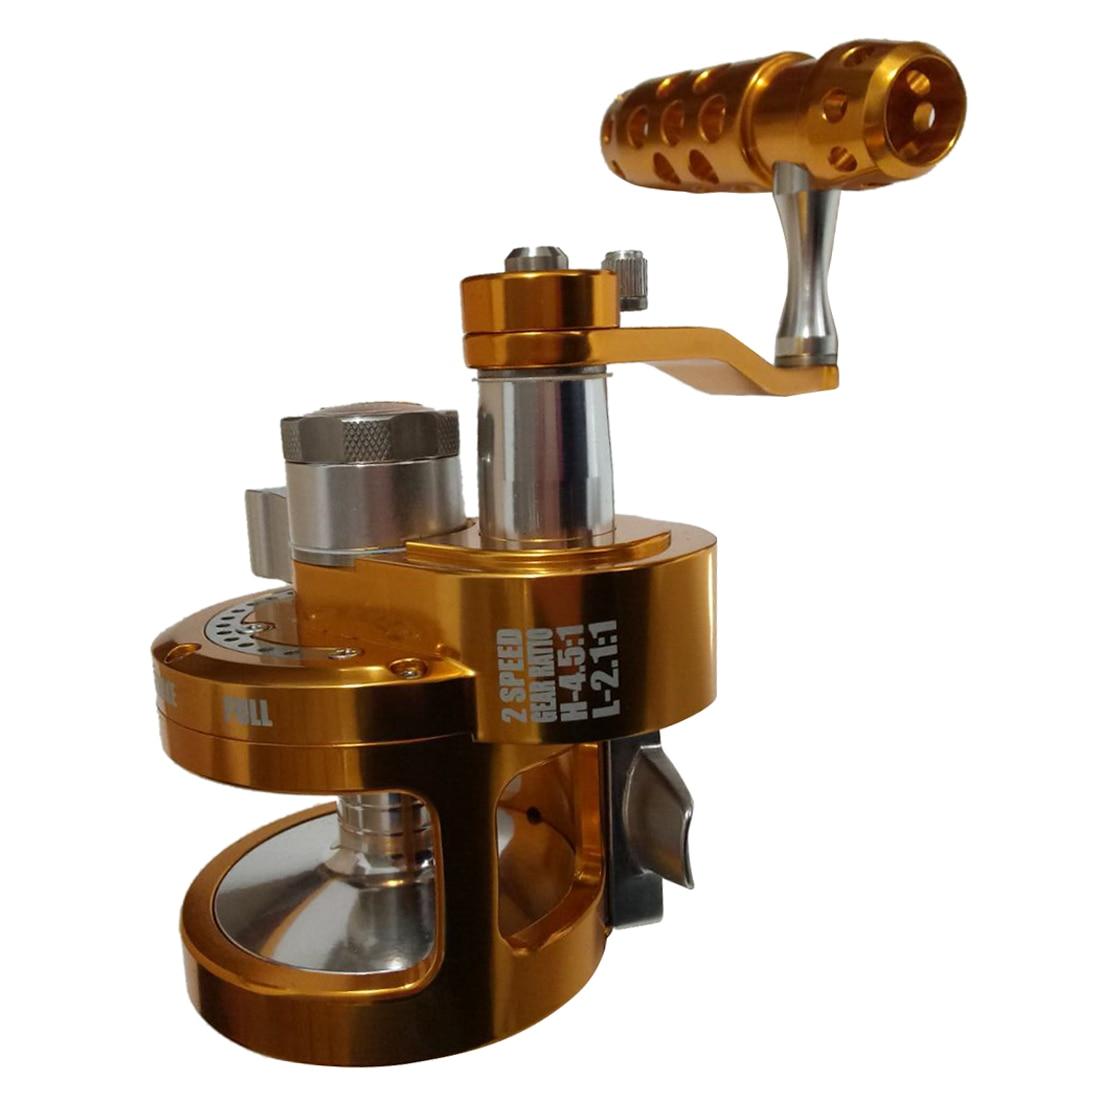 BMDT-Full Metal Reel Double Speed Trolling Fishing Reel 30kgs Power Drag Deep Sea Saltwater Boat Reel SYD70 4.5:1 2.1:1 left